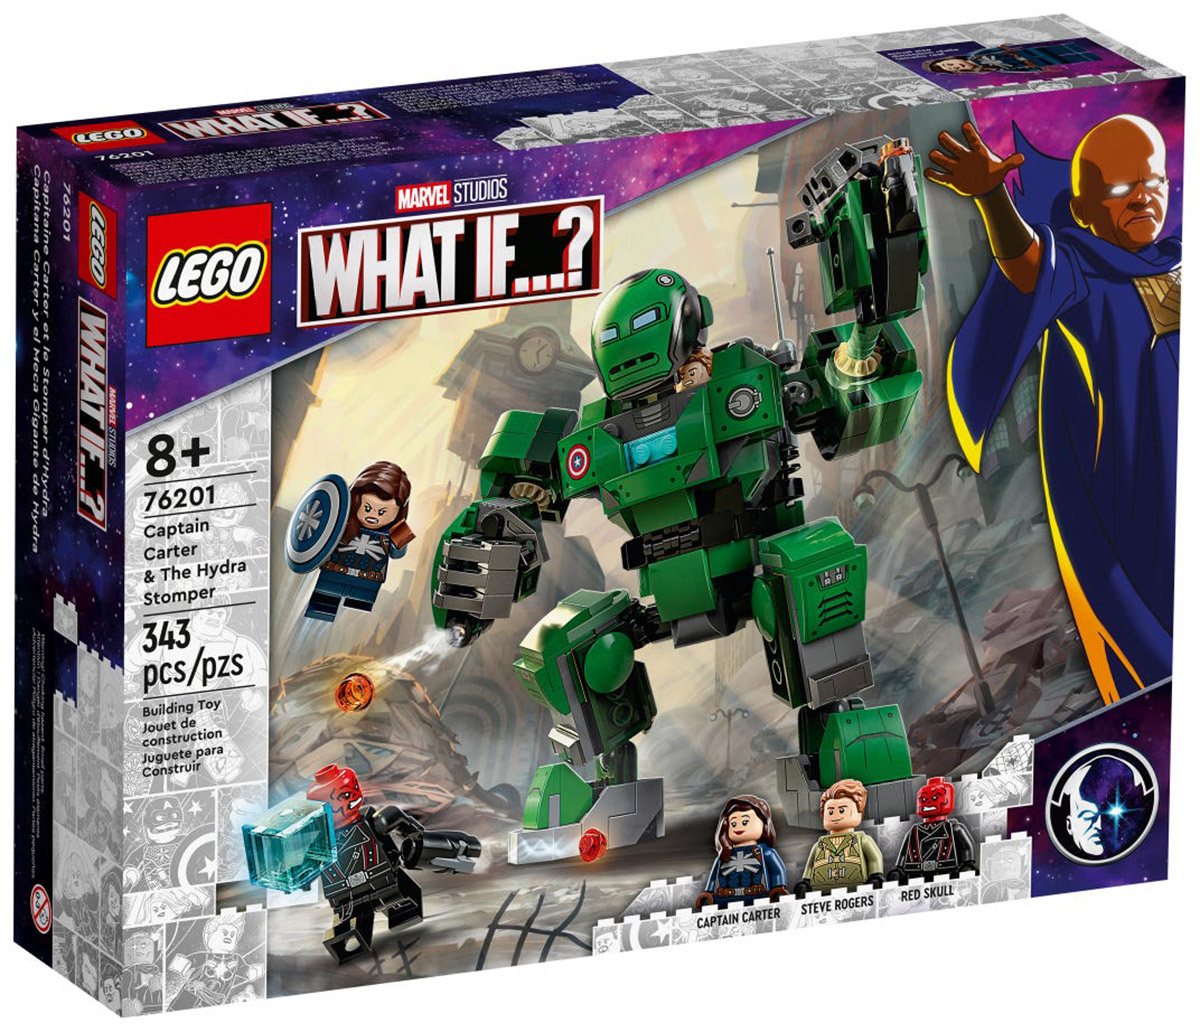 LEGO Marvel 76201 Captain Carter & The Hydra Stomper // Août 2021